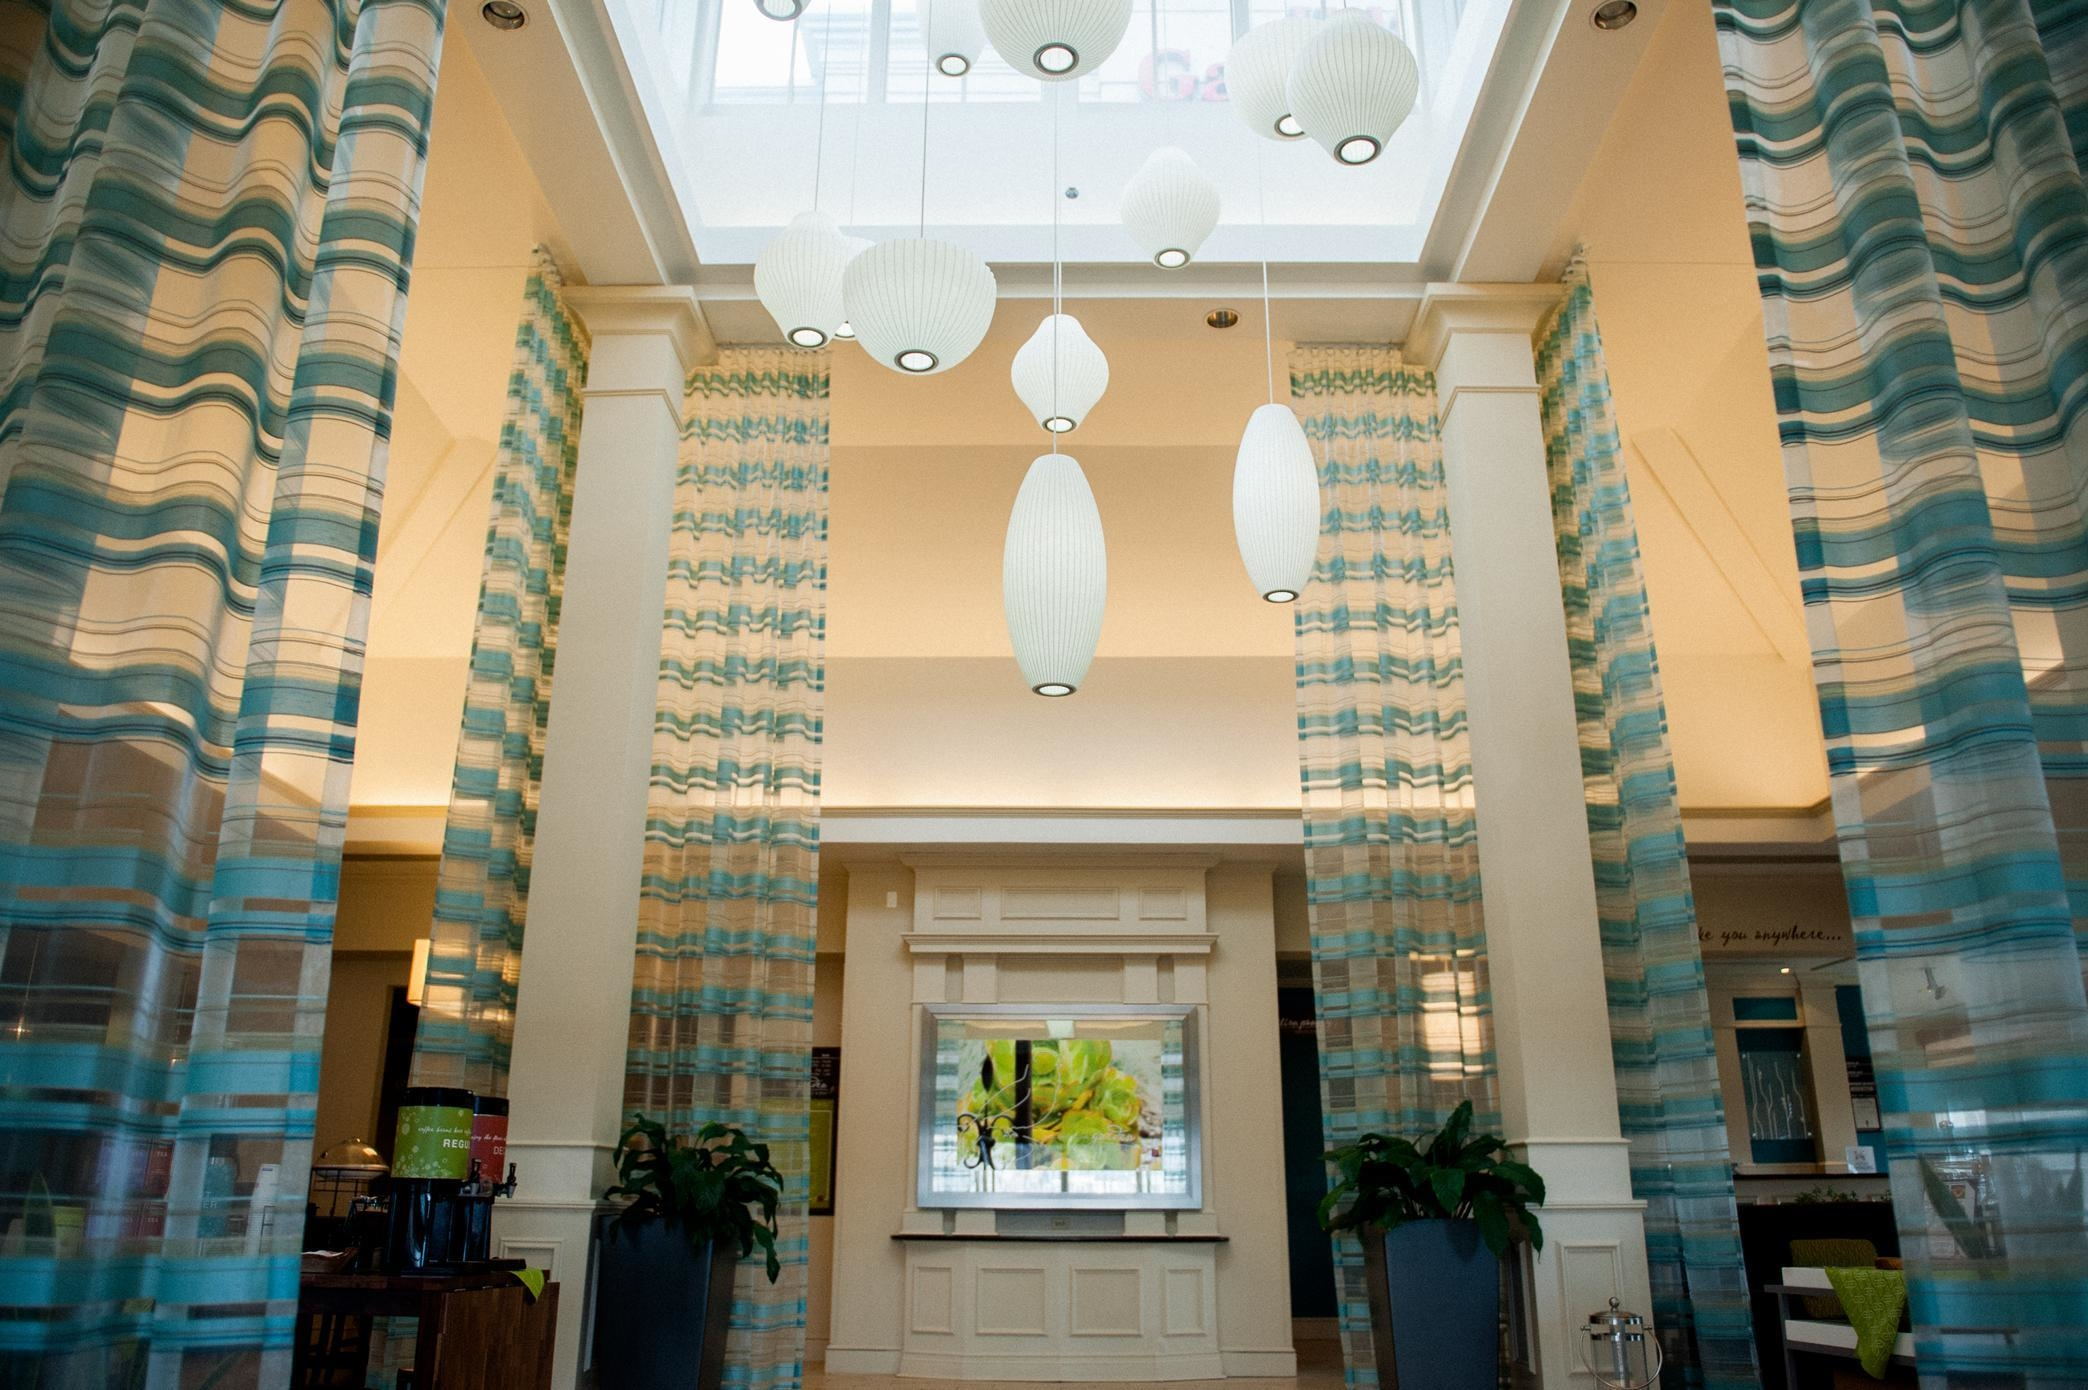 Hilton Garden Inn Rockaway image 2